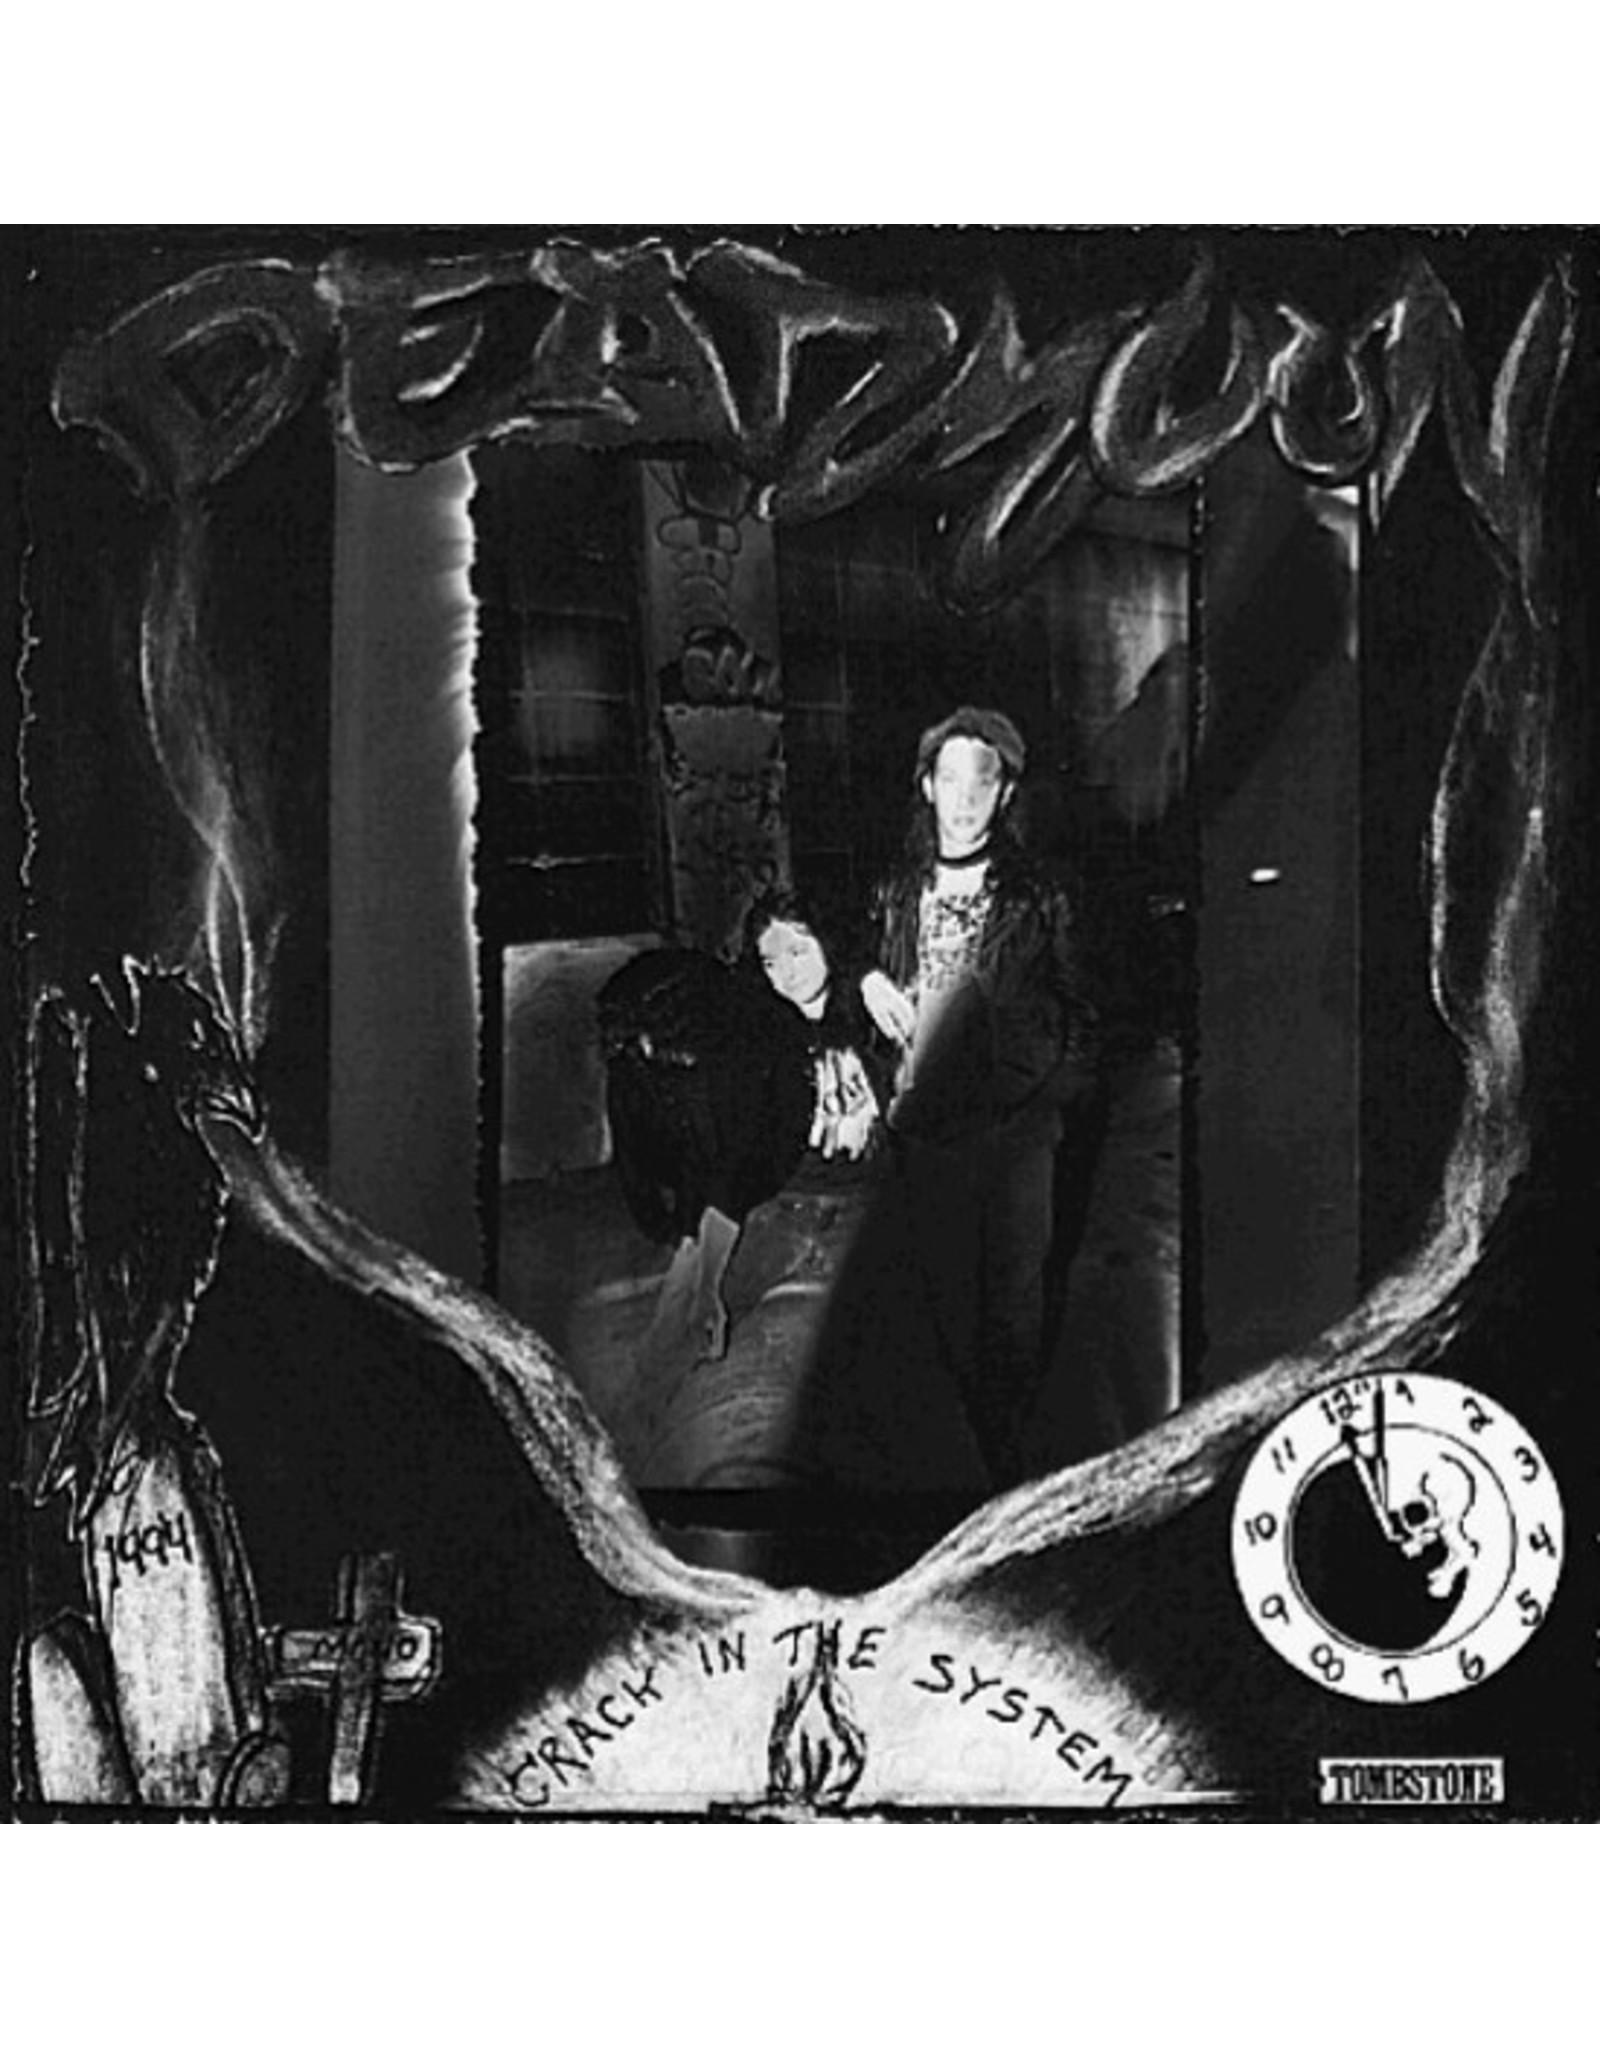 New Vinyl Dead Moon - Cracks In The System LP